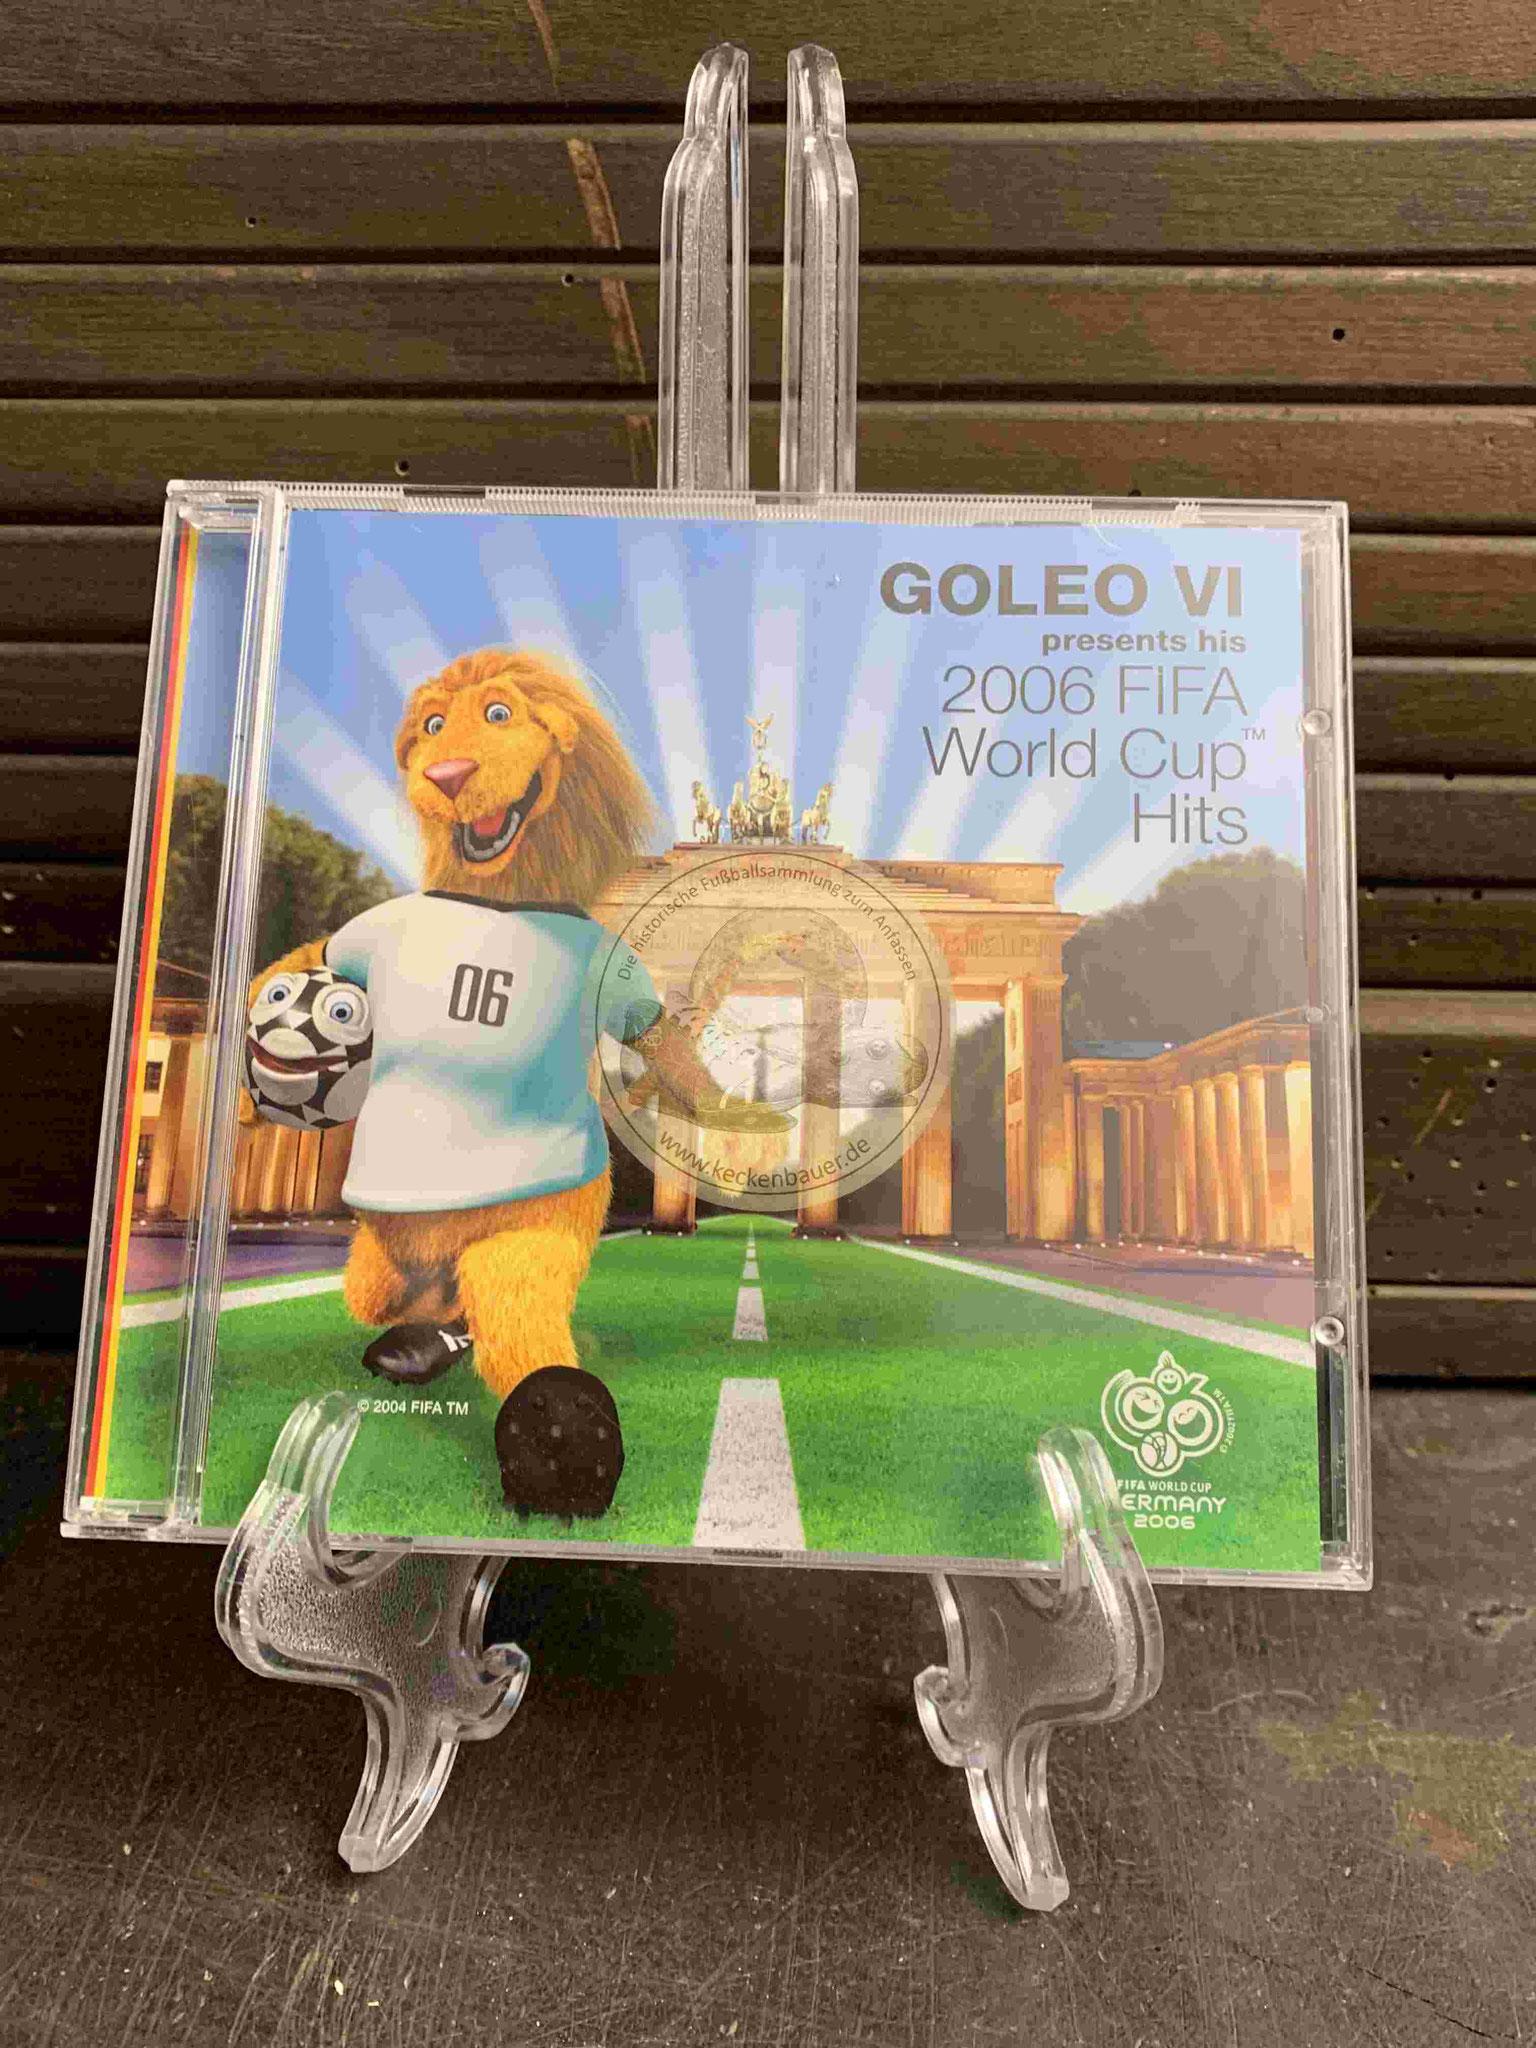 2006 Goleo VI 2006 FIFA World Cup Hits